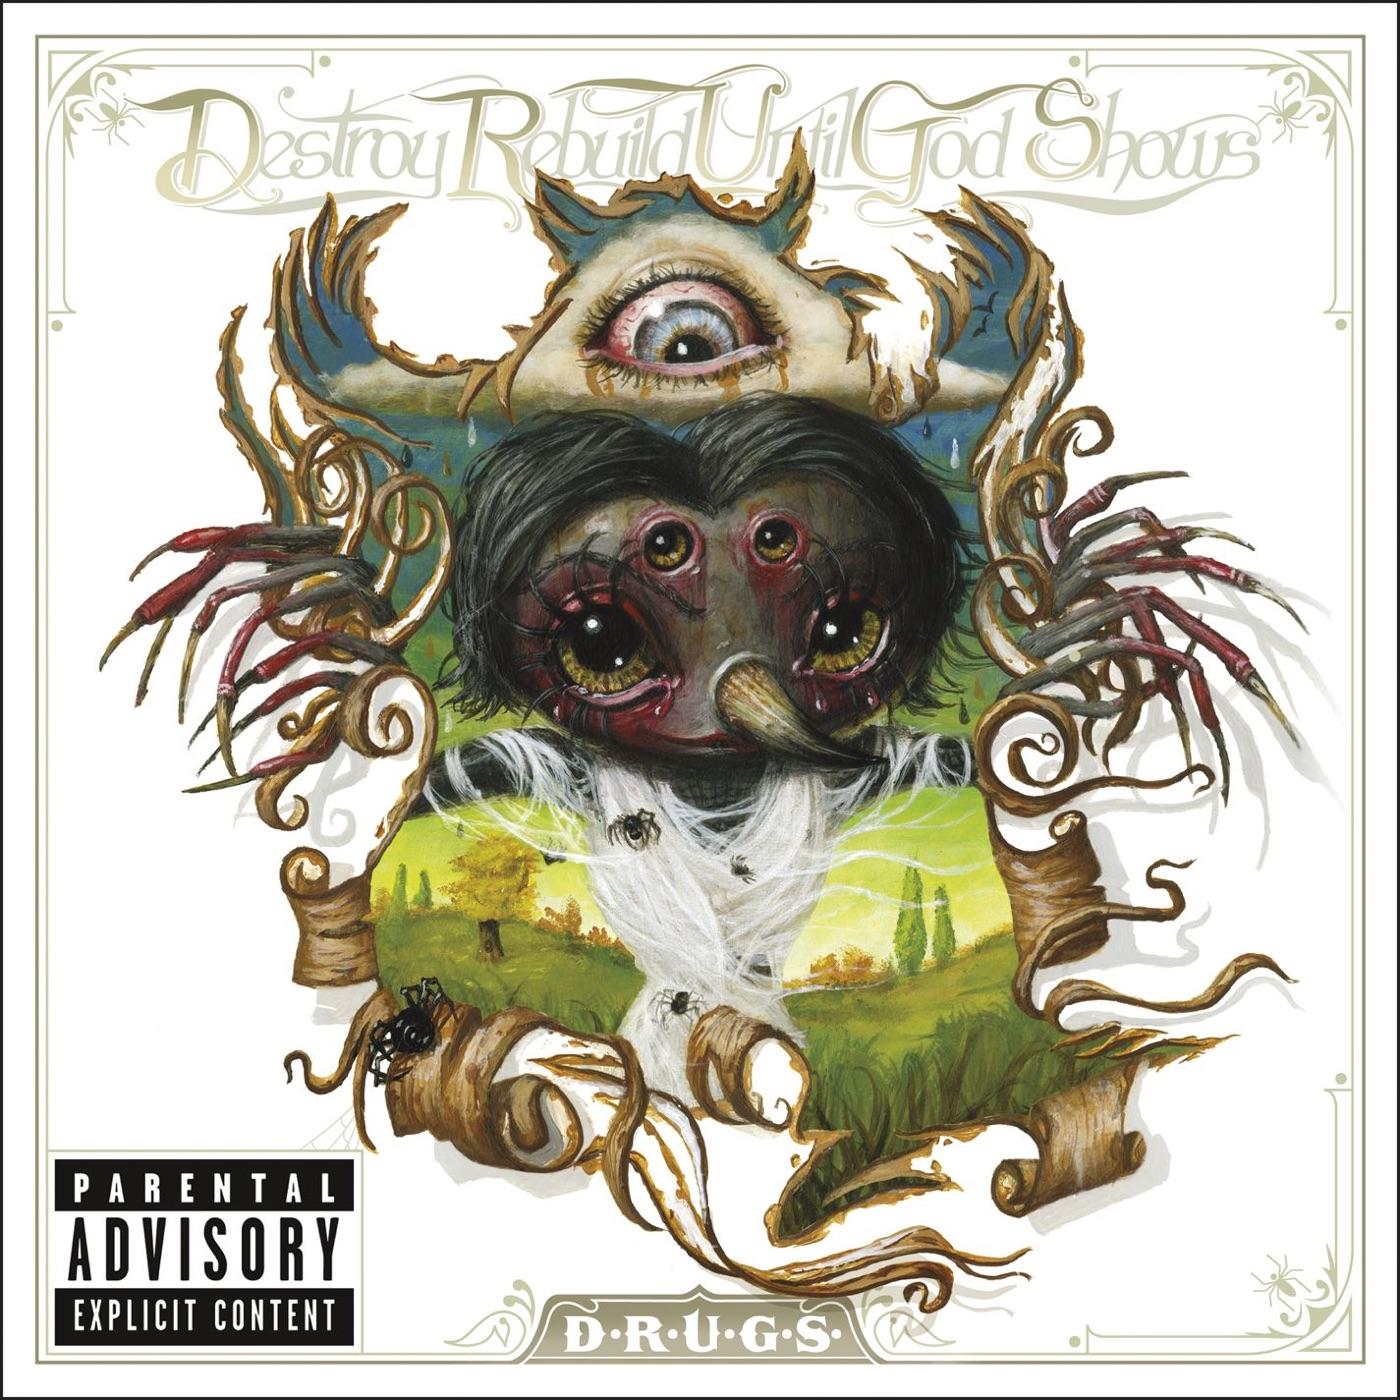 Destroy Rebuild Until God Shows - D.R.U.G.S. (Deluxe Edition) (2011)